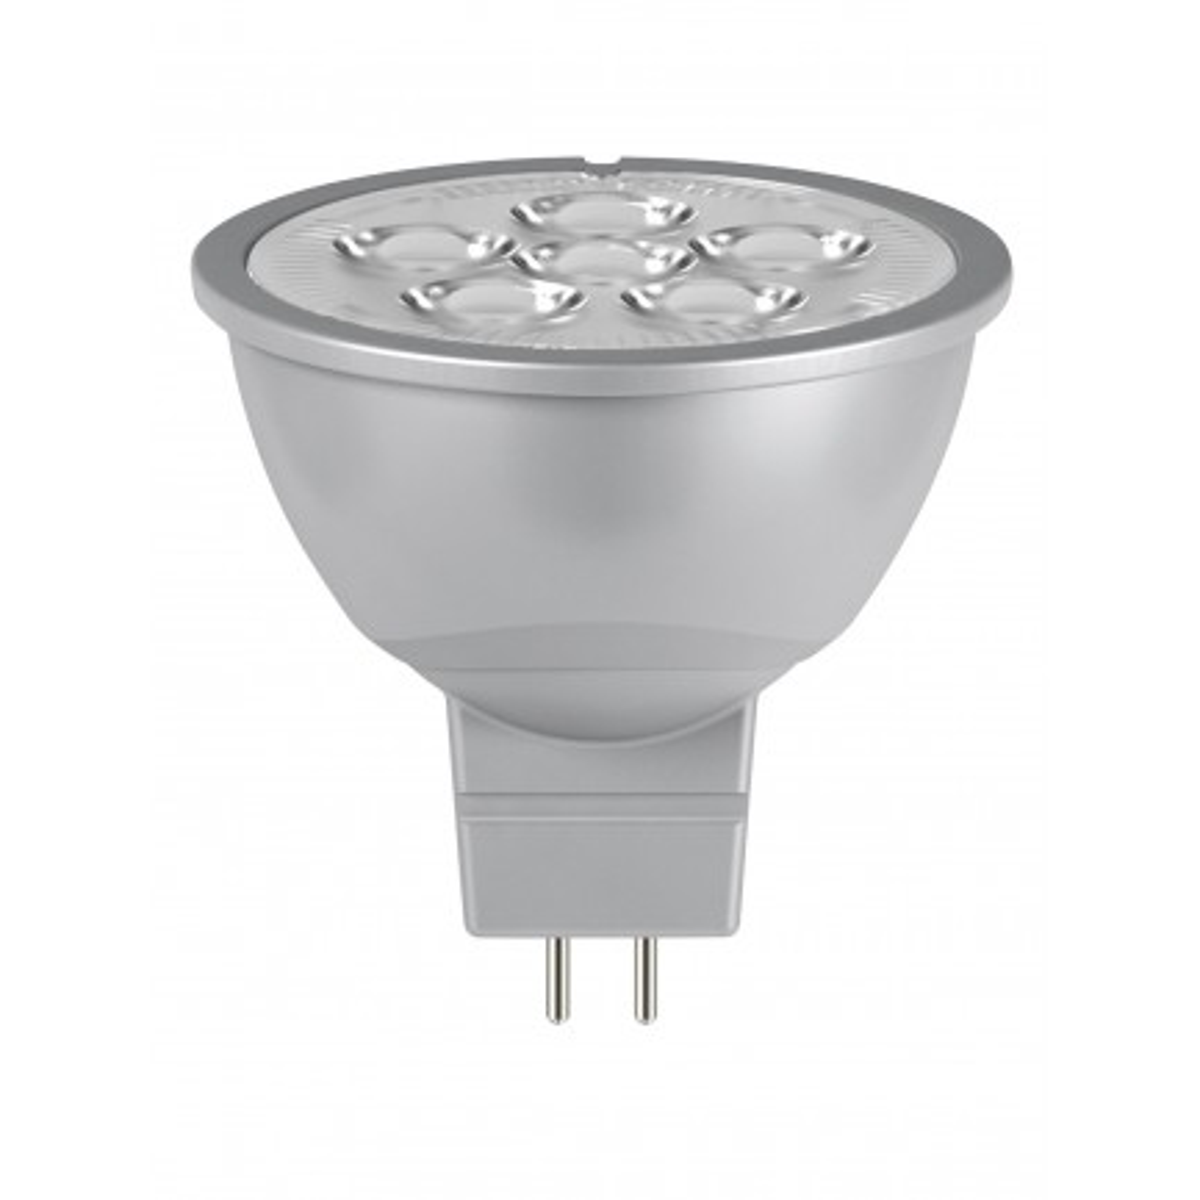 GE LED BULB GU10 4.5 Watt 60DEG Warm White